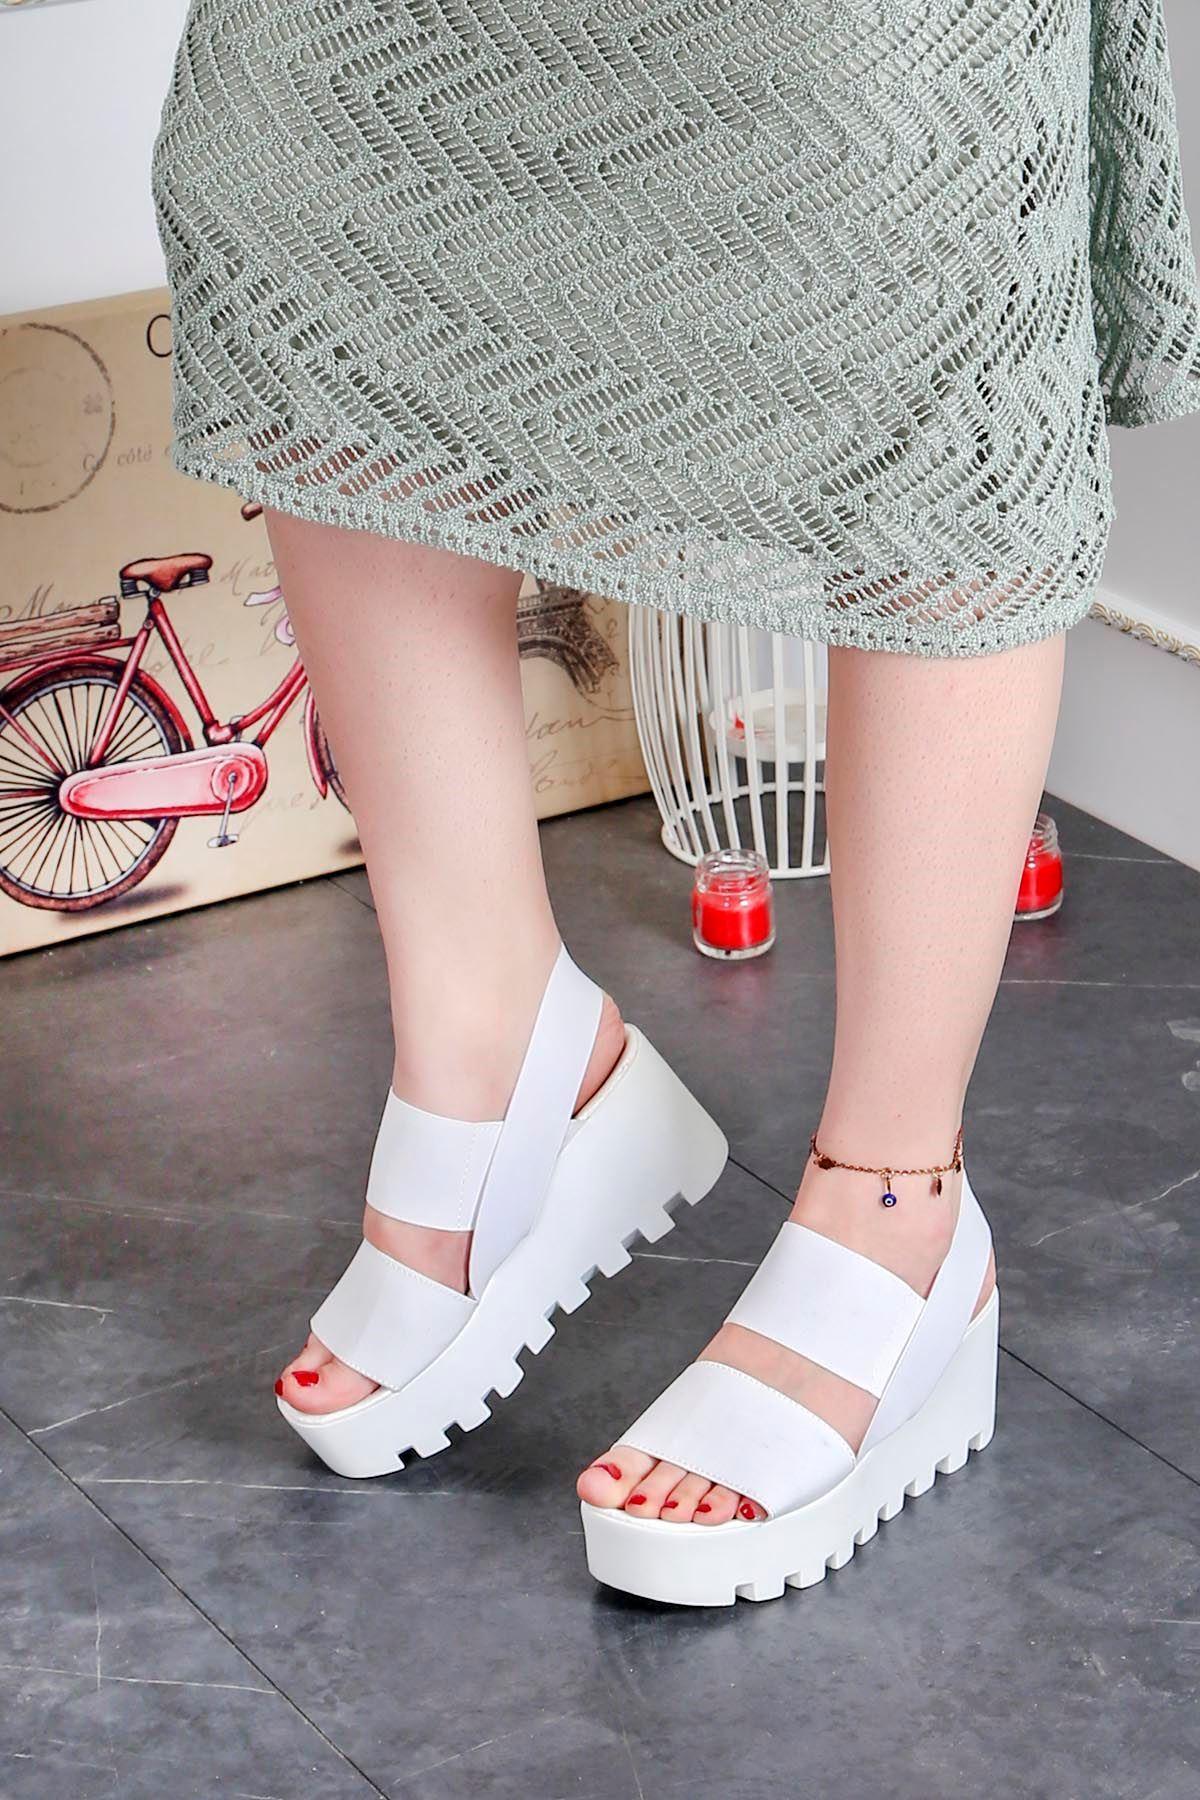 Ck-207 Lastikli Dolgu Taban Sandalet Beyaz